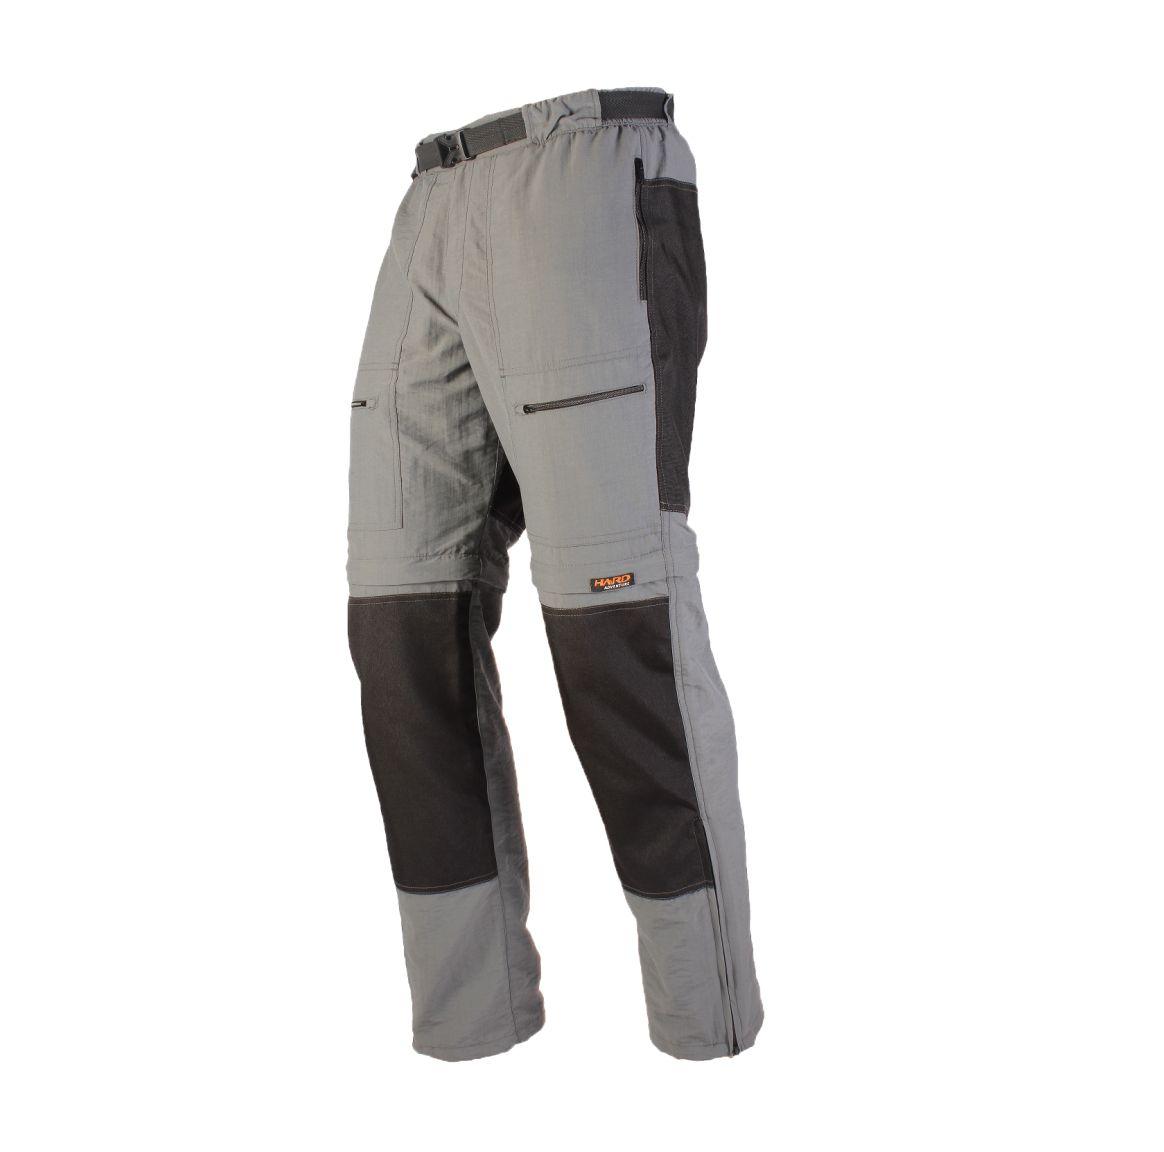 Calça-Bermuda Masculina reforçada com Cordura  Hard Pro Mountain - Cinza Claro